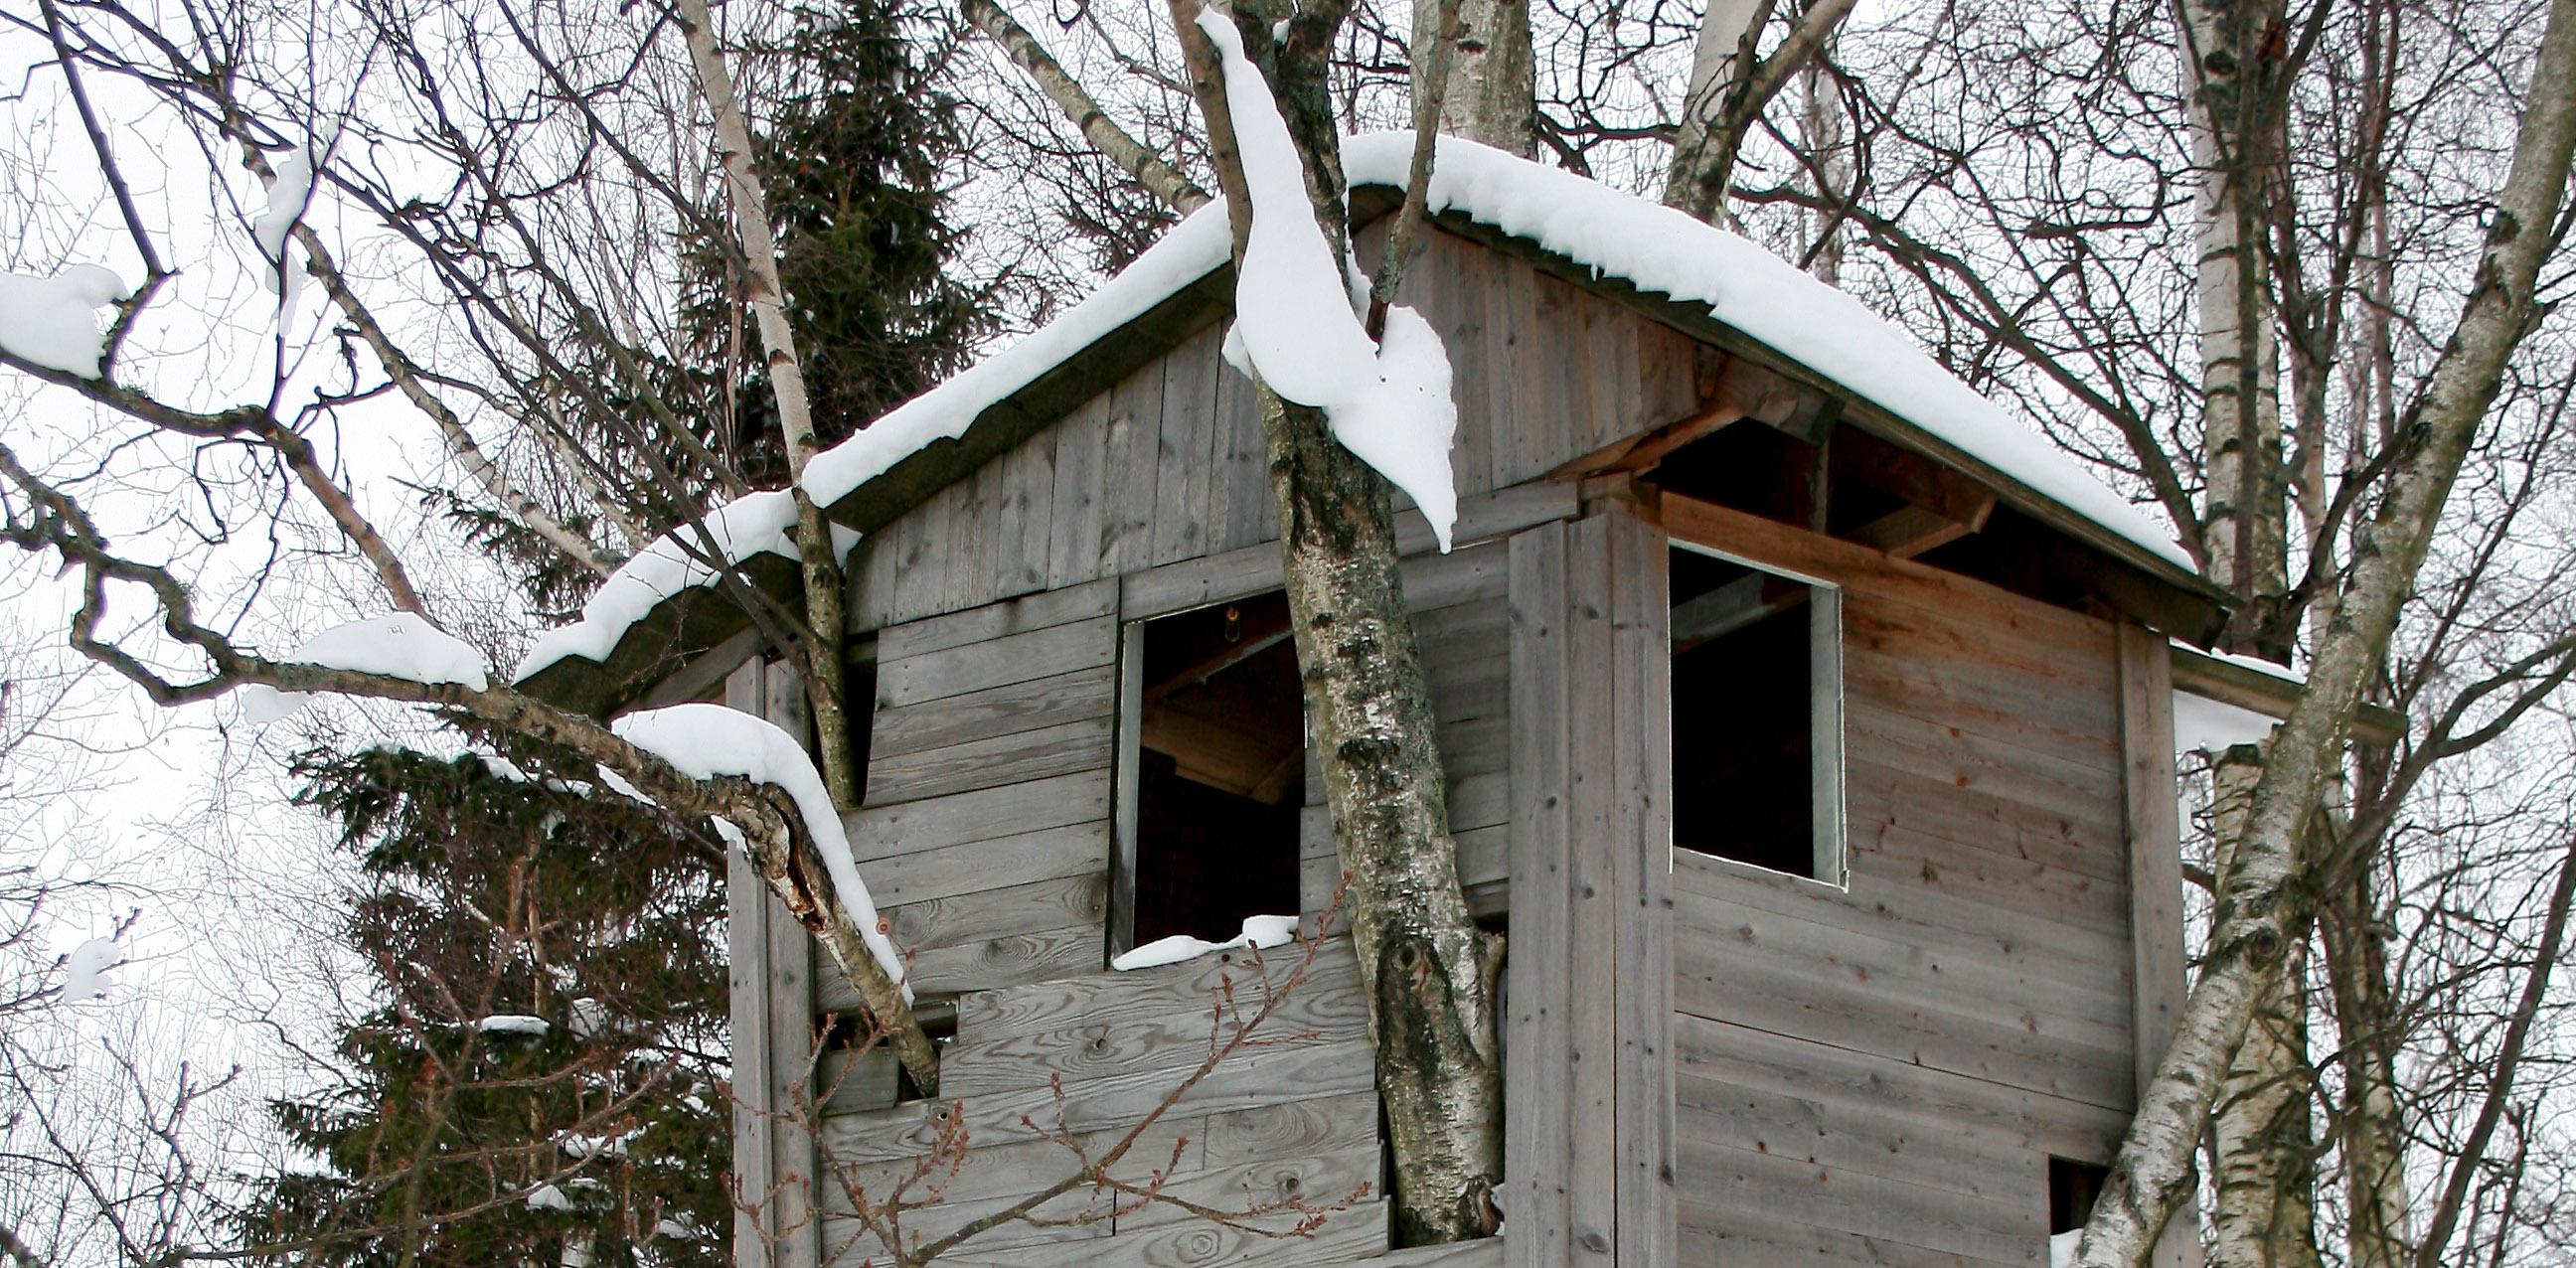 Bygge hytte trærne